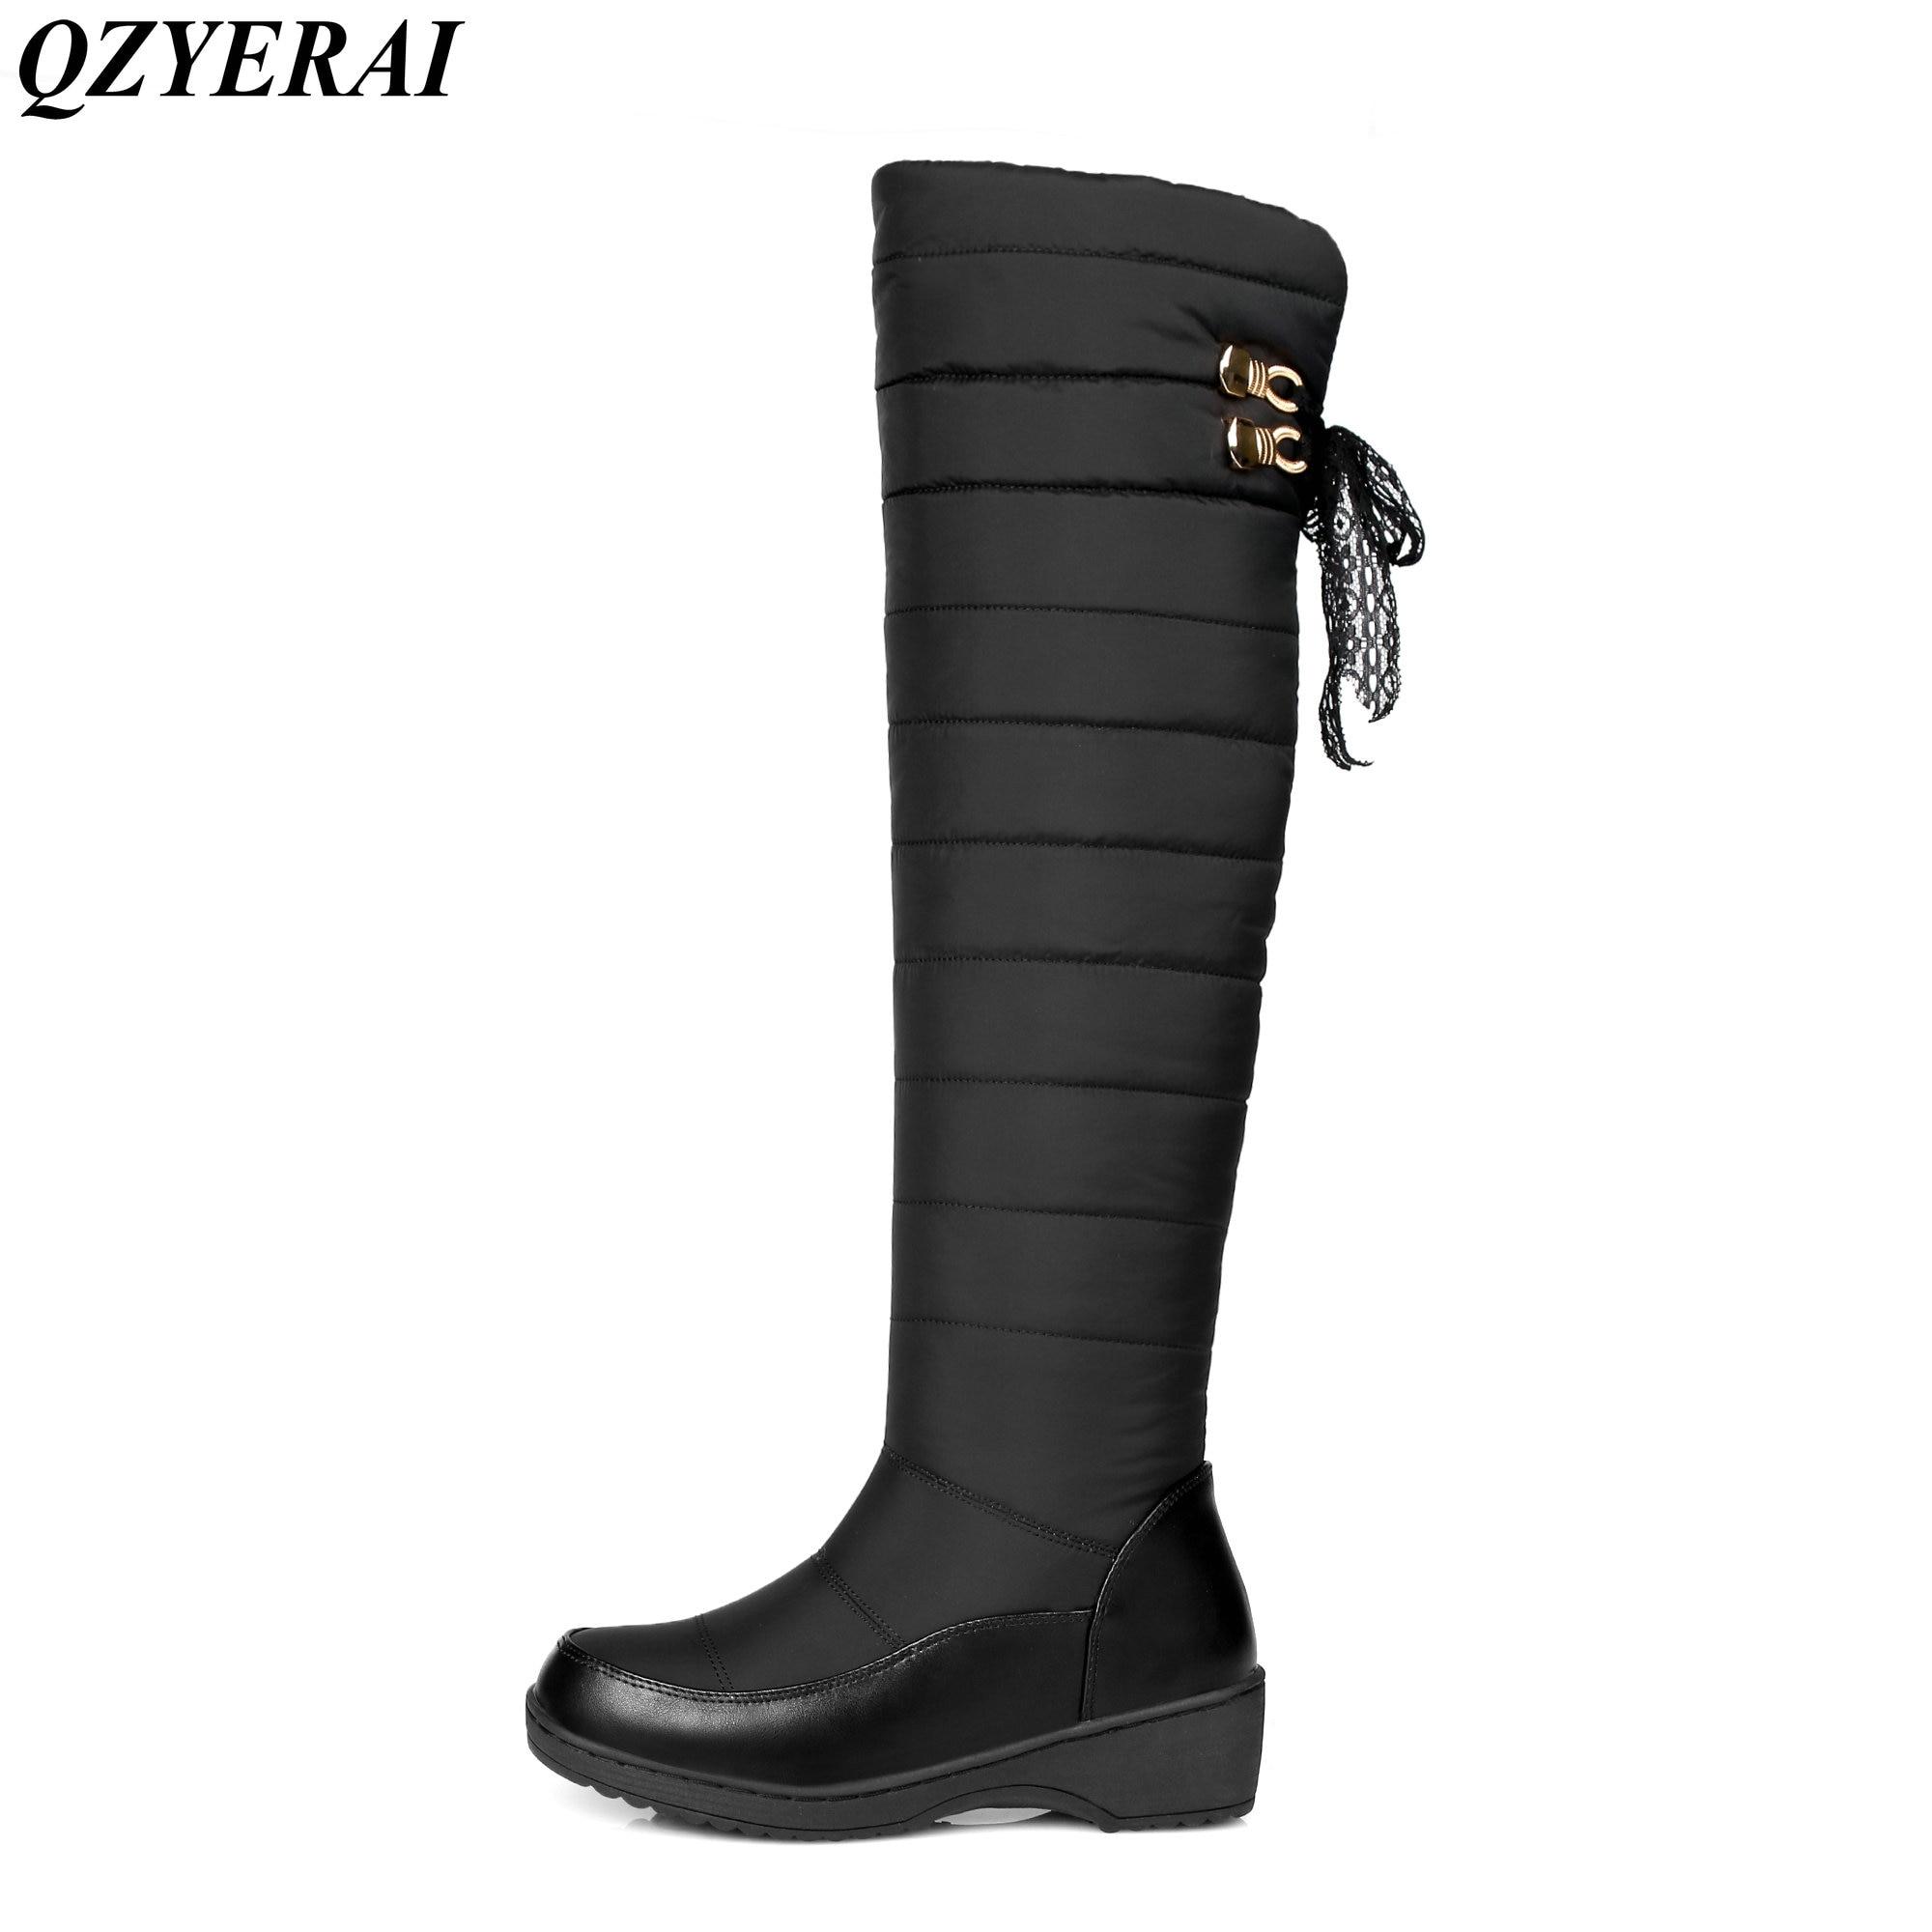 QZYERAI Hot selling winter minus 40 degrees cotton warm snow boots font b women b font